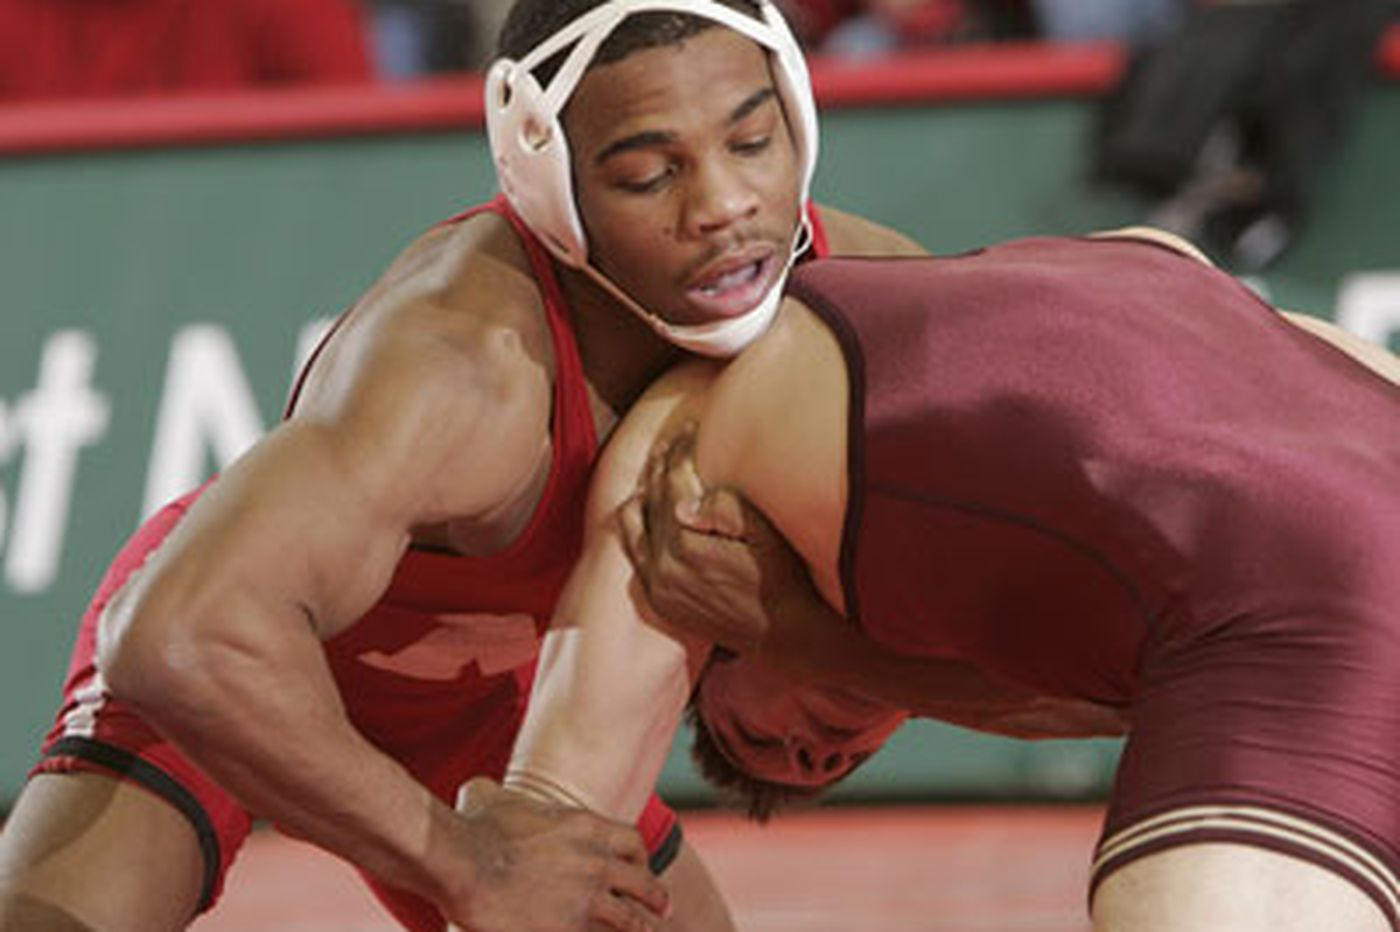 Winslow Township wrestler Jordan Burroughs on the brink of becoming an Olympian